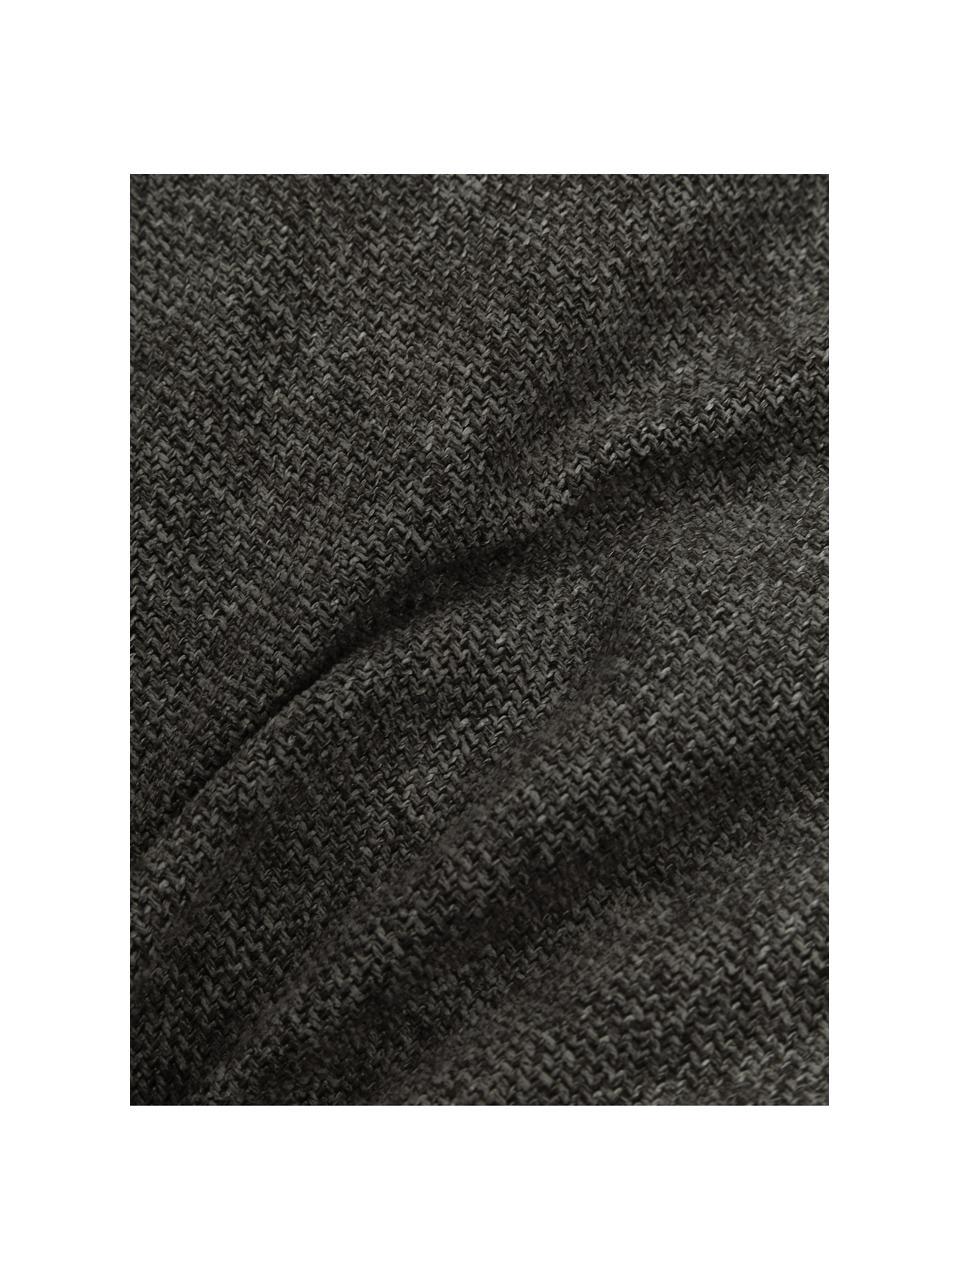 Coussin canapé 60x60 gris anthracite Lennon, Anthracite